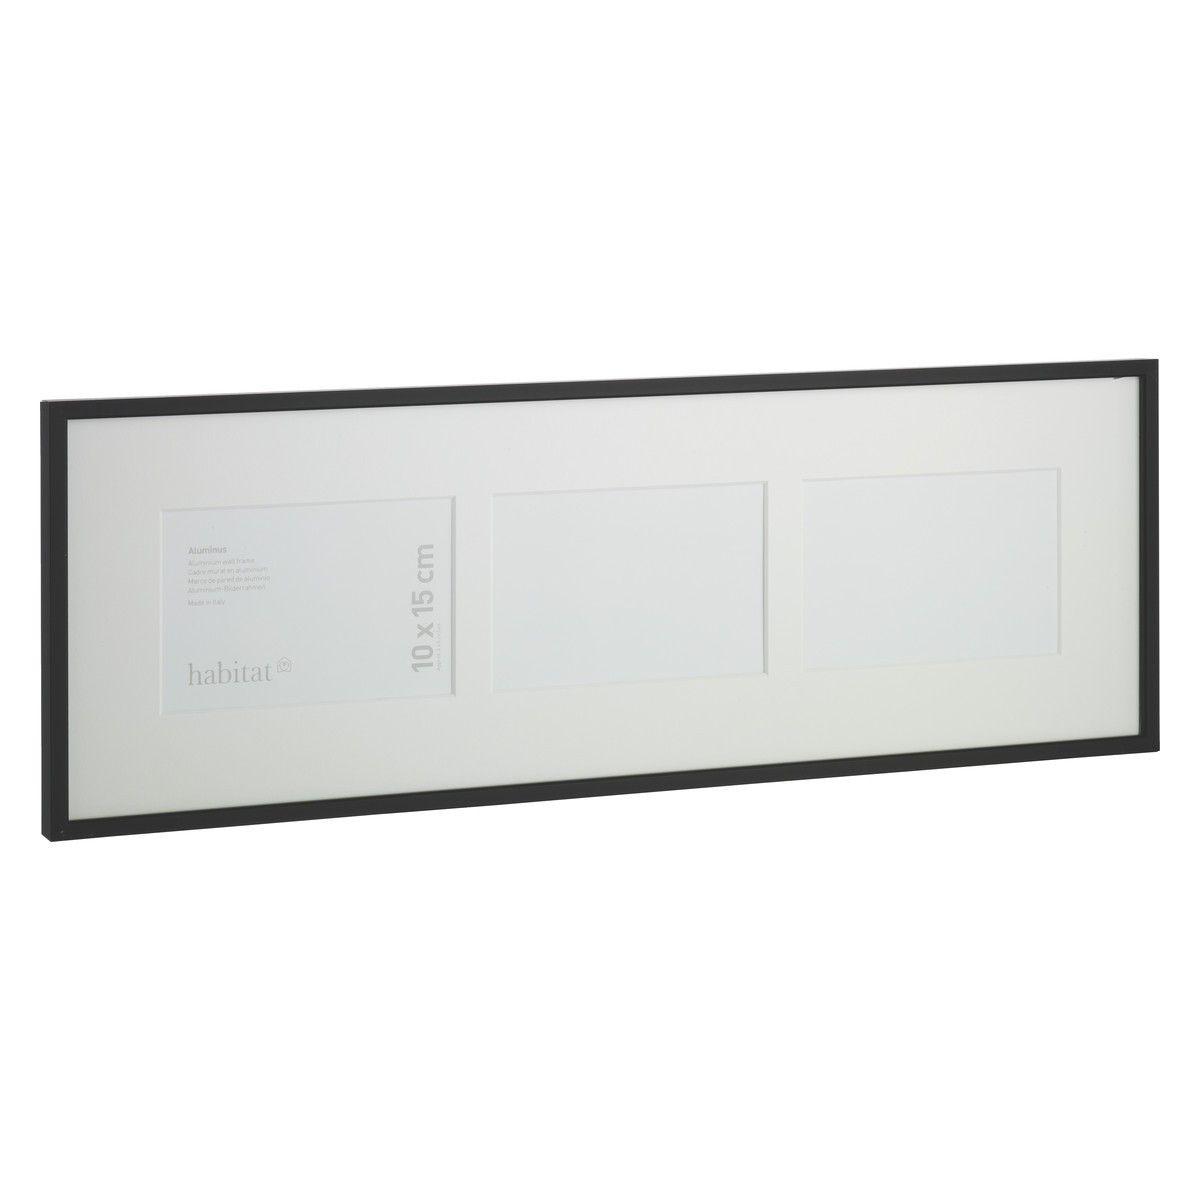 Aluminus 19 X 57cm 7 5 X 22 5 3 Aperture Black Picture Frame Black Picture Frames Black Picture Picture Frames